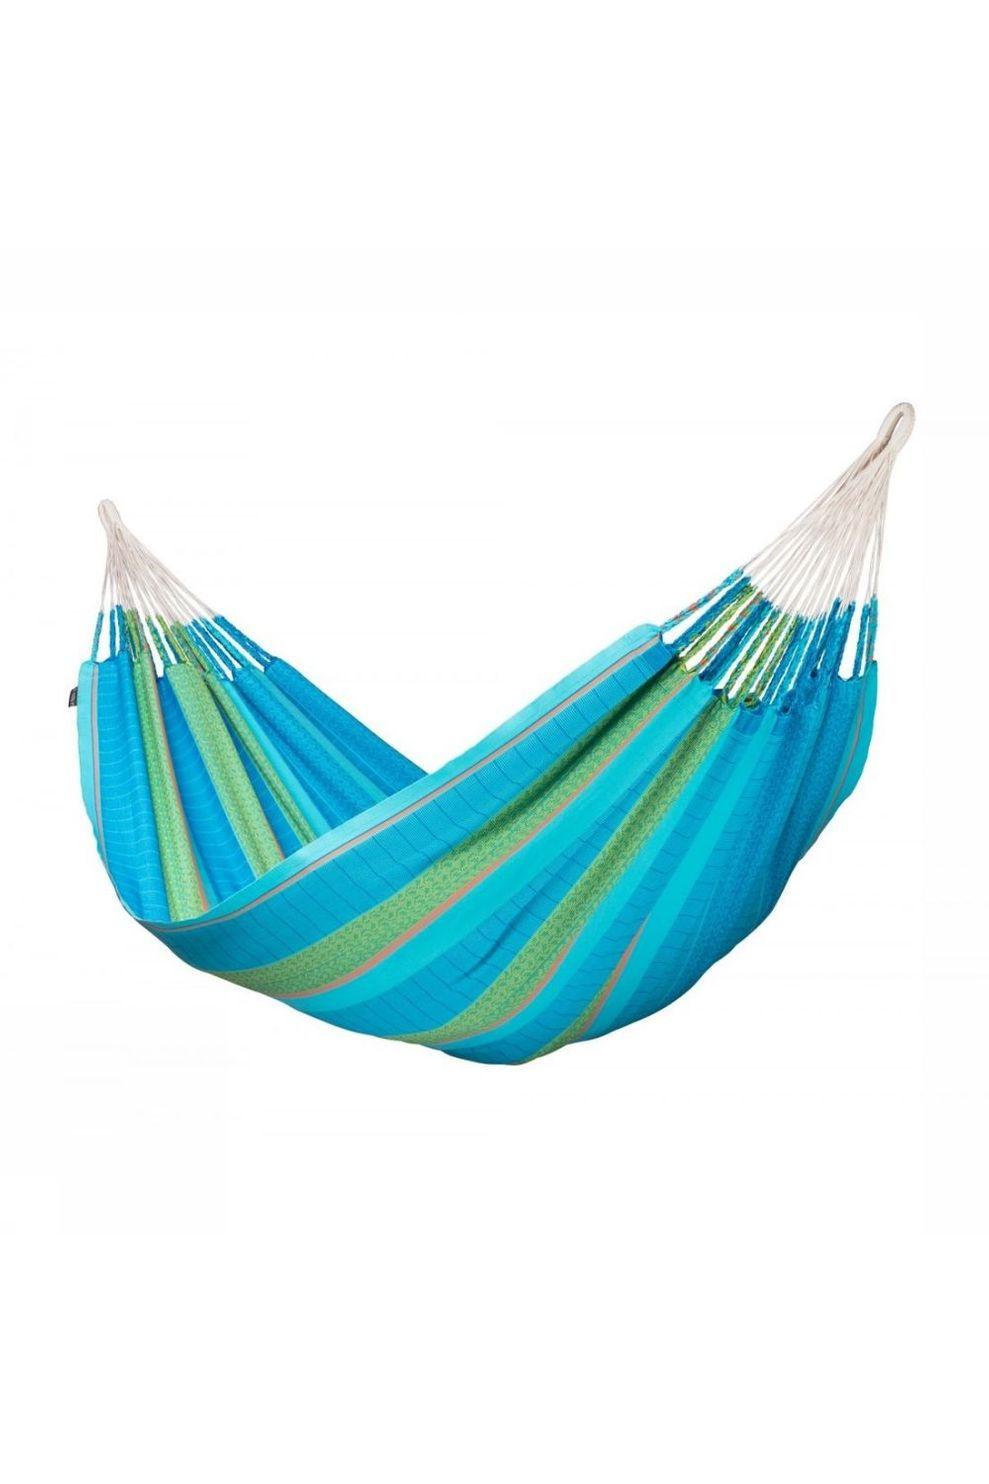 La Siesta Hangmat Flora Kingsize - Blauw